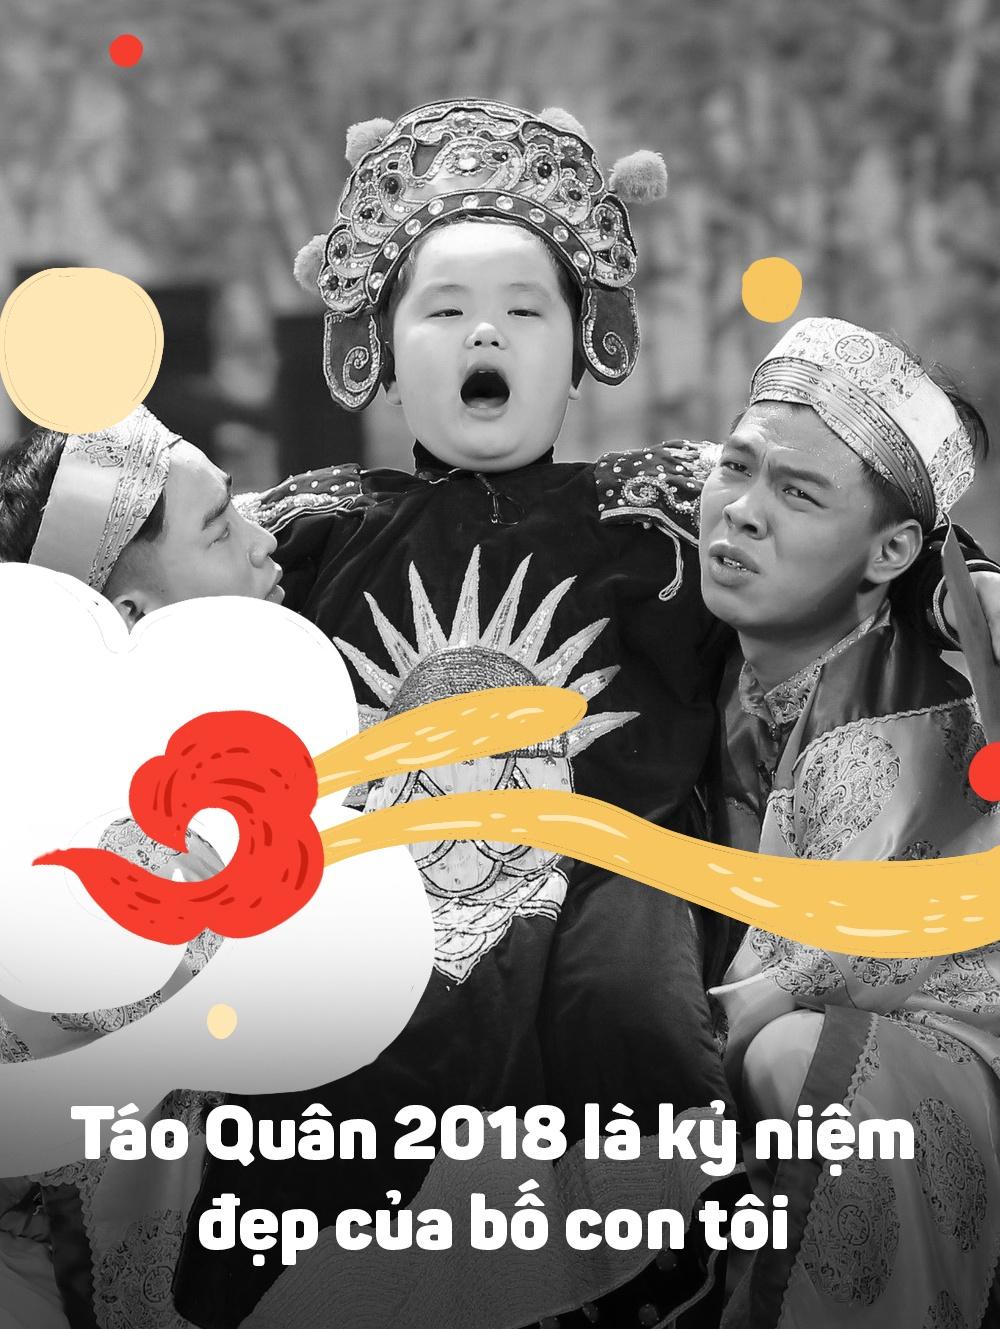 Dang sau su so vo cua 'Nam Tao' Xuan Bac hinh anh 9